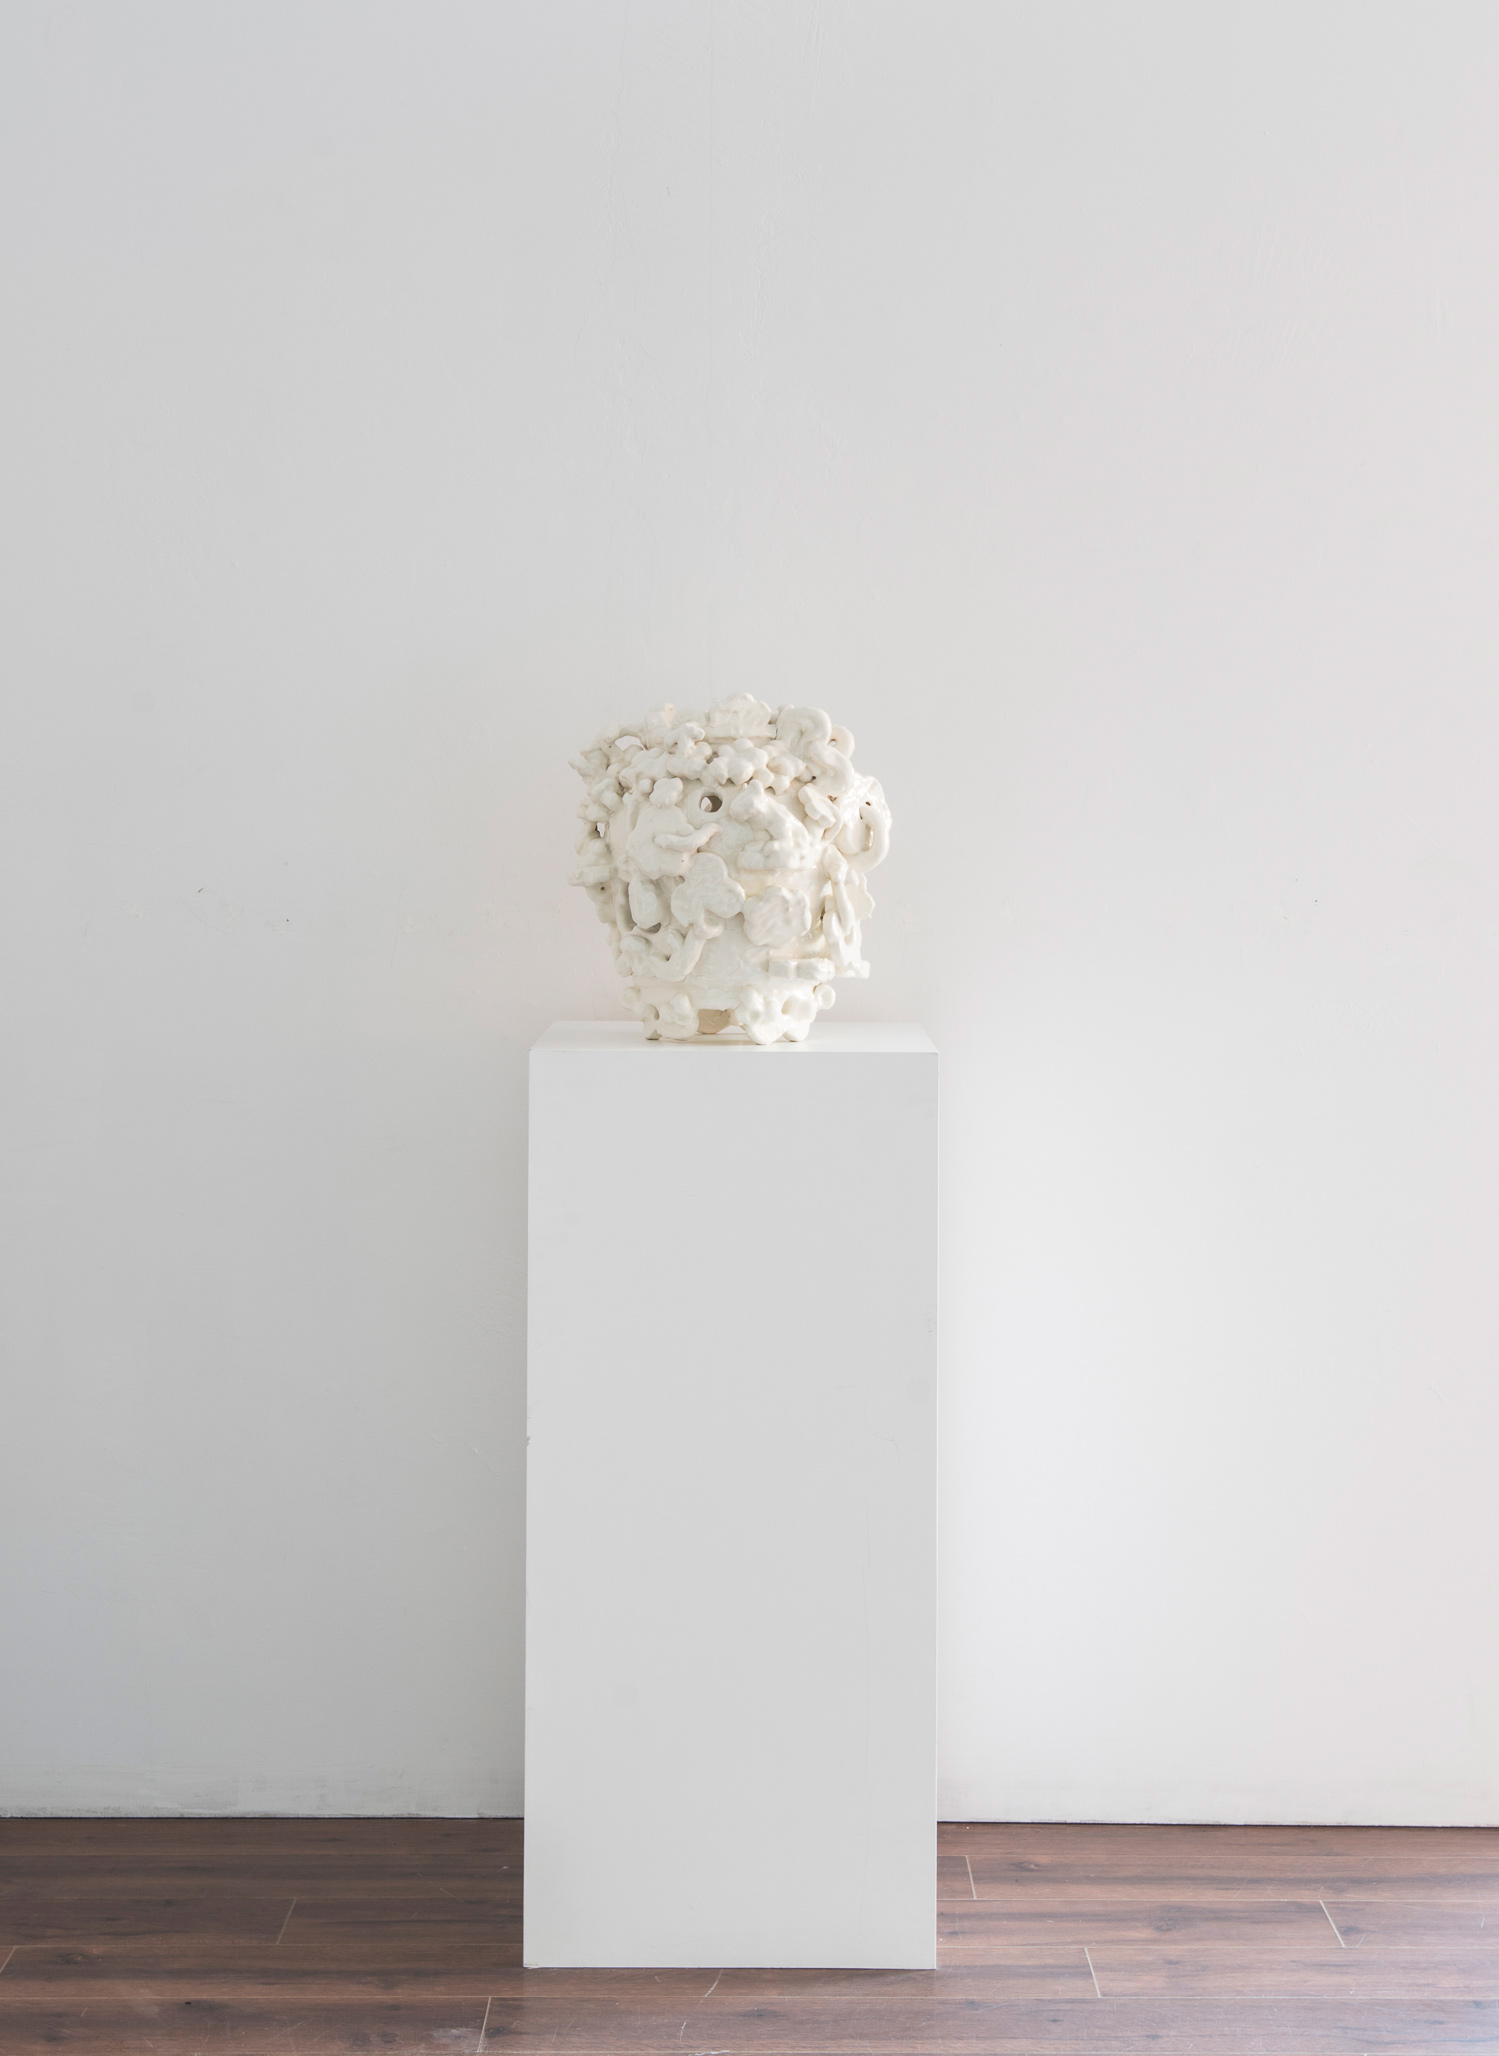 Jeffry Mitchell, Animal Jar, 2016